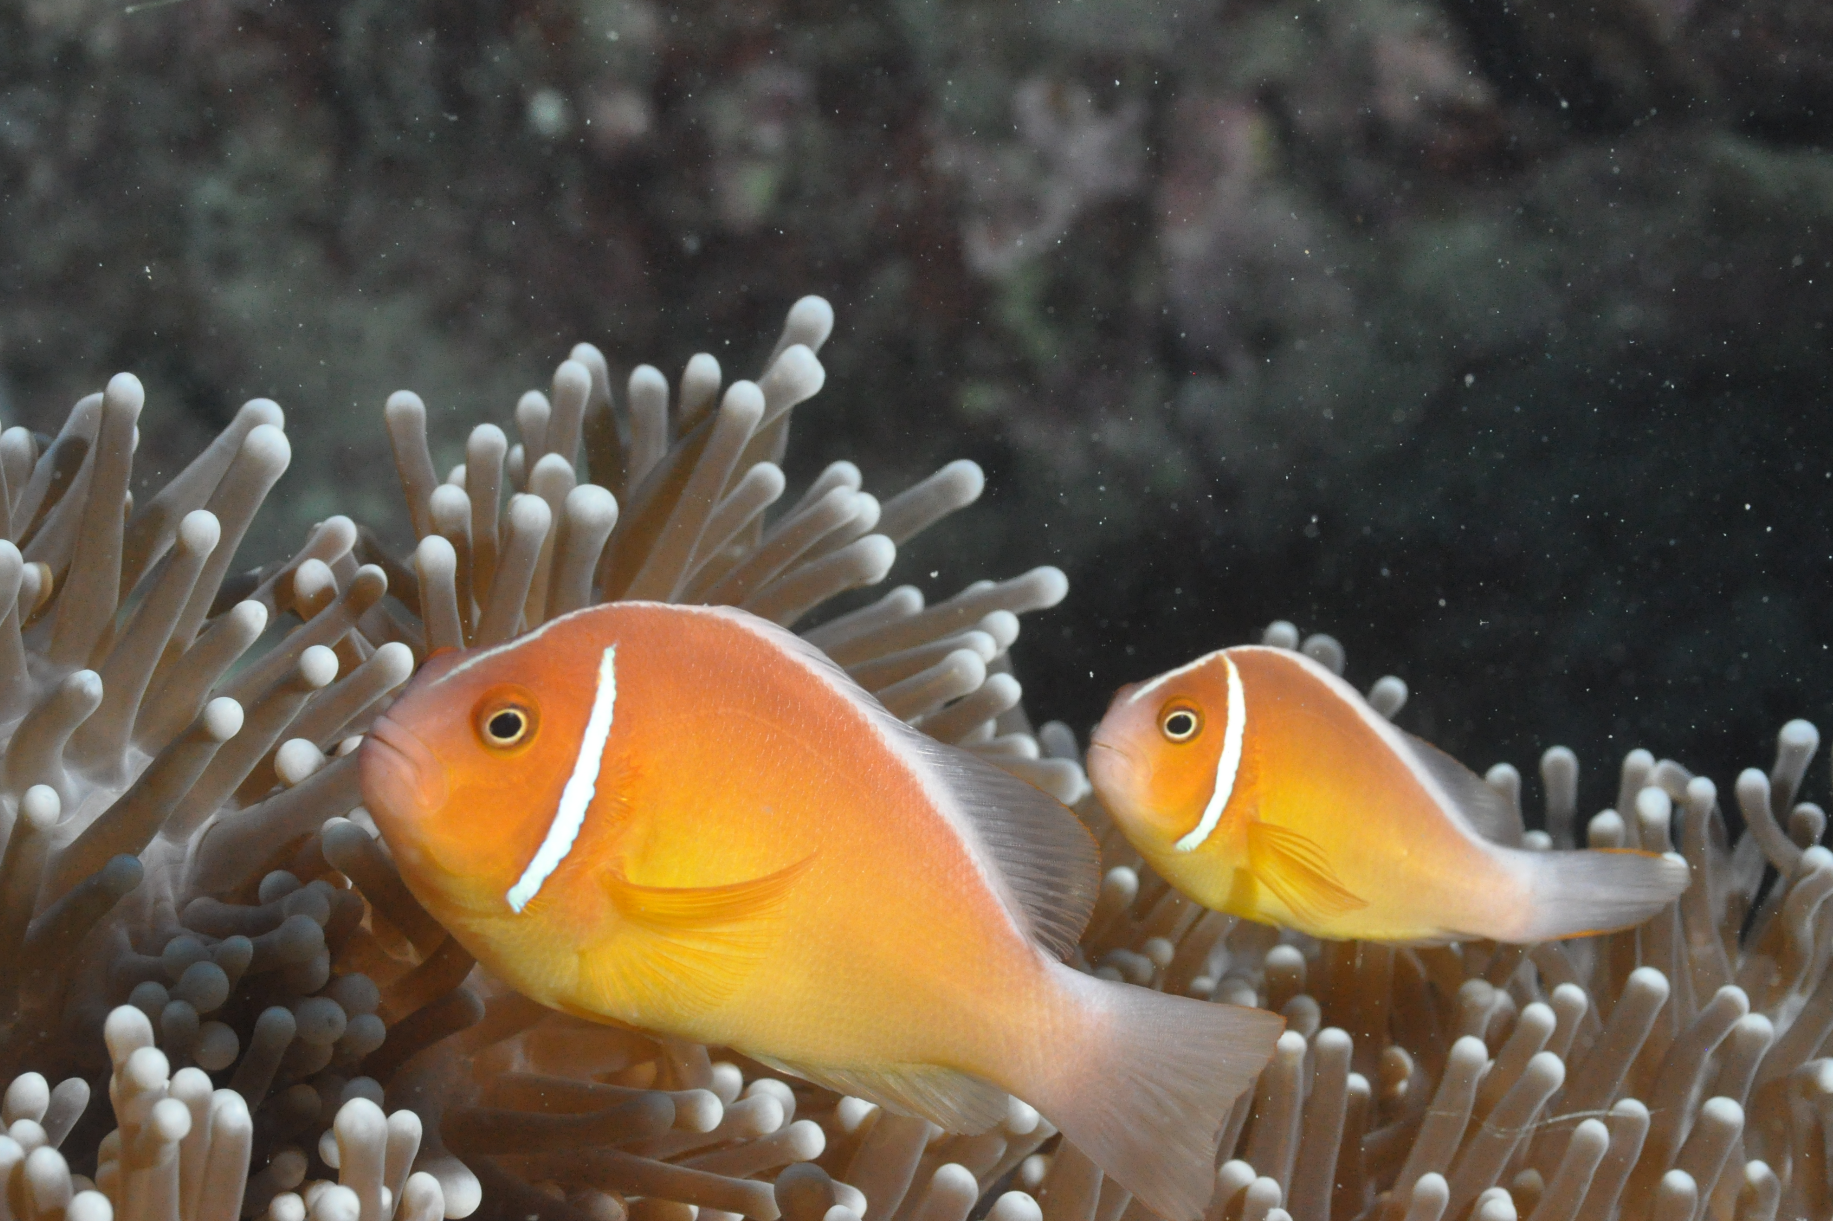 clown fish CREDIT: THE OCEAN AGENCY / XL CATLIN SEAVIEW SURVEY